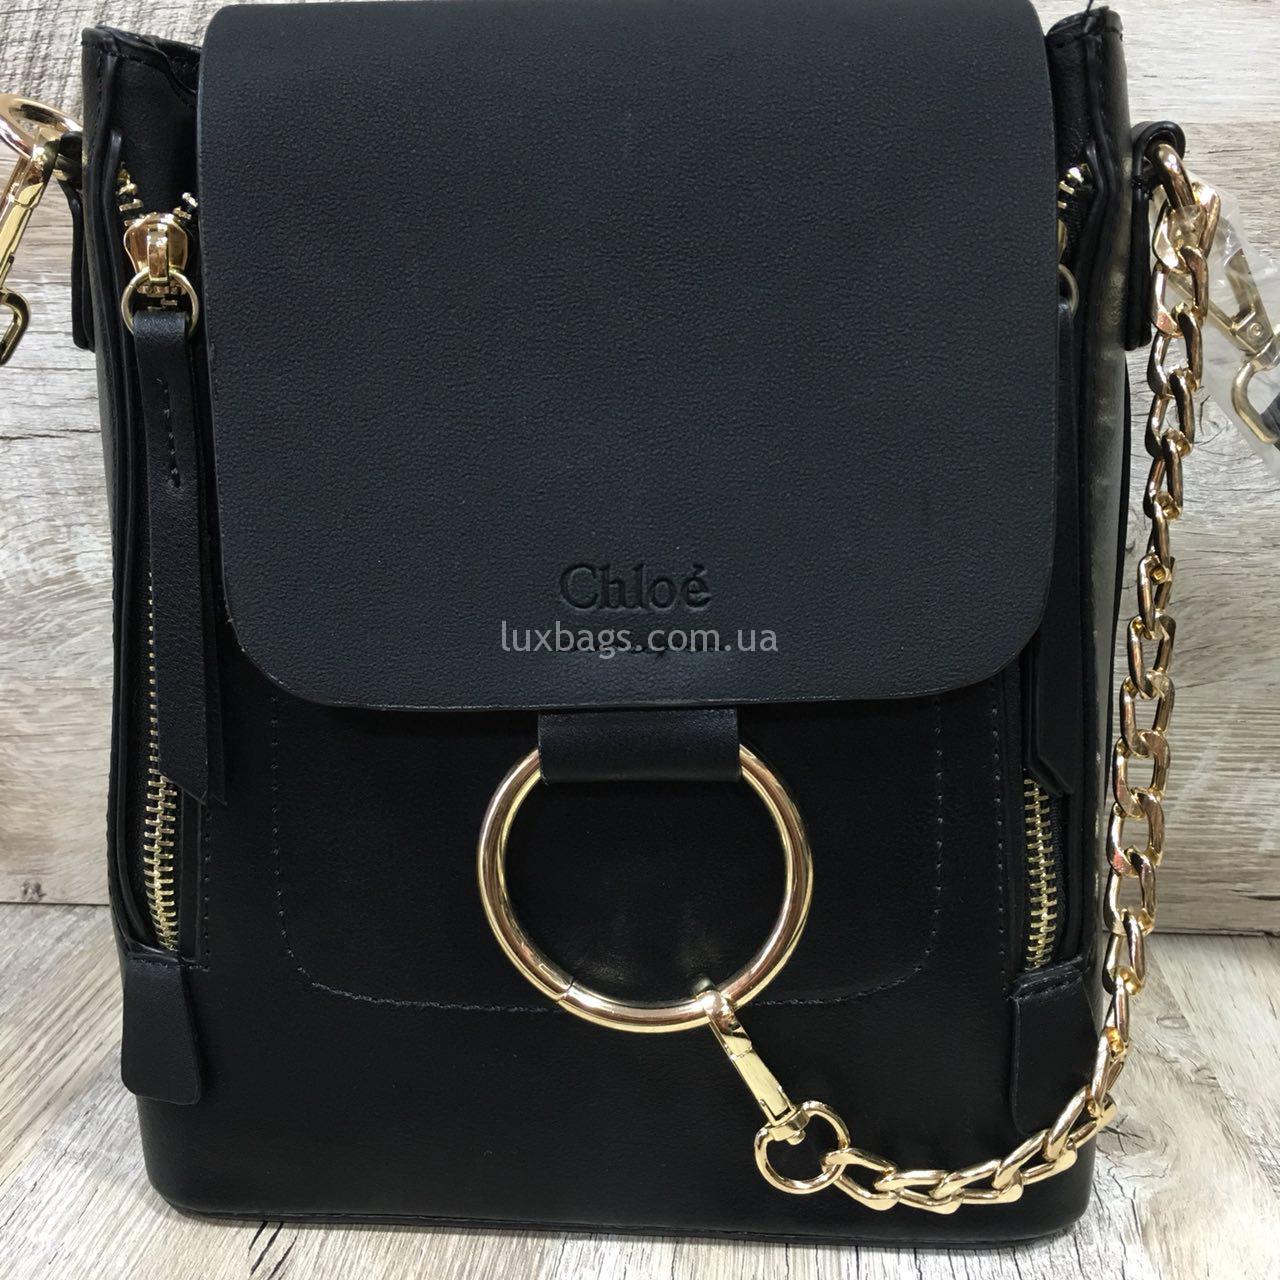 37426a451395 Женская рюкзак-сумка CHLOÉ Faye Купить на lux-bags